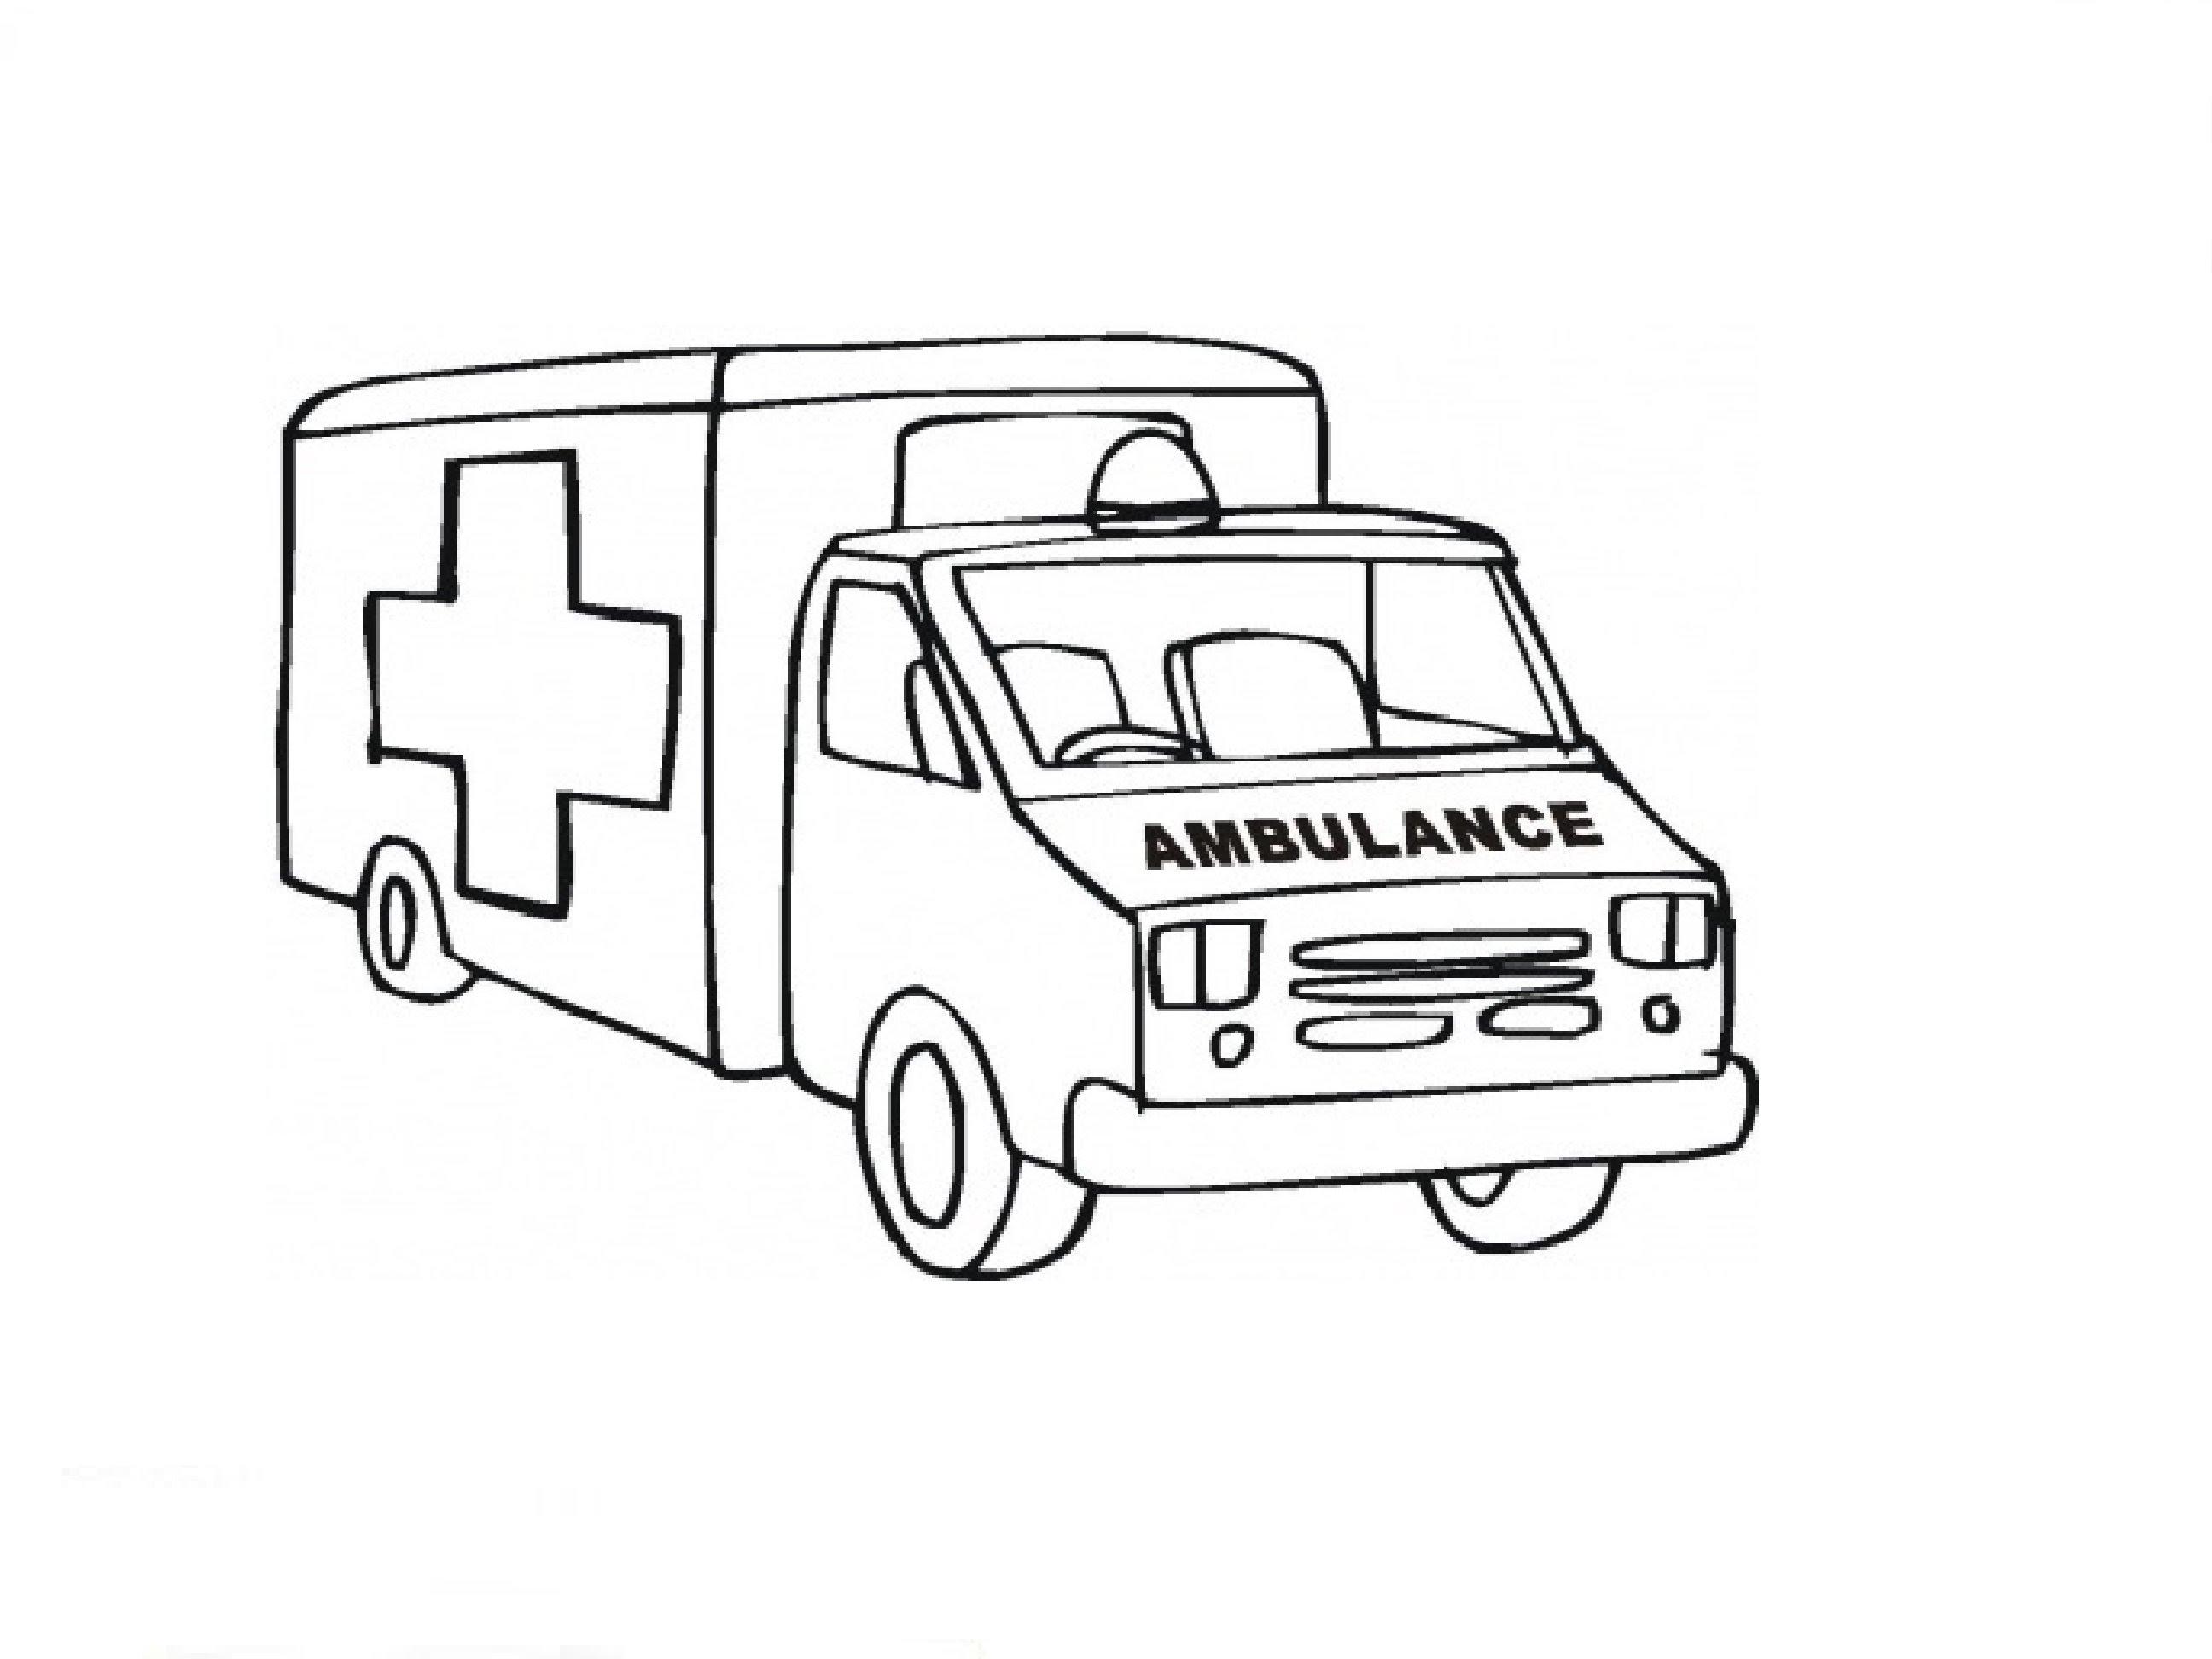 2592x1944 How To Draw An Ambulance Car